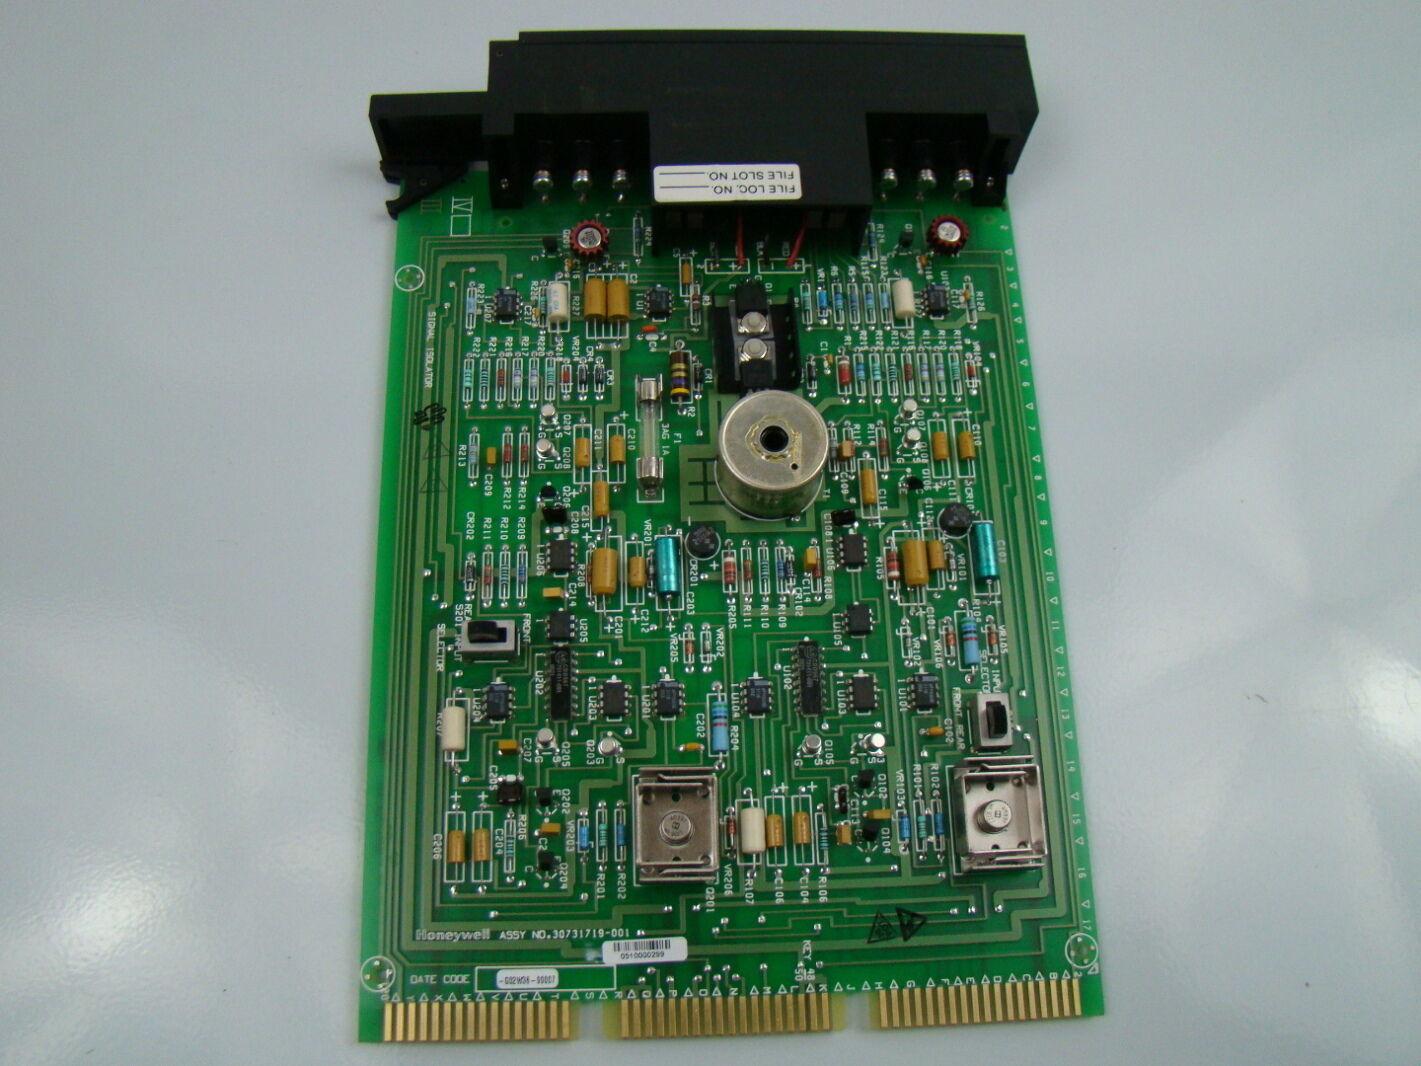 Signal Isolation Circuit : Honeywell assy no signal isolator circuit